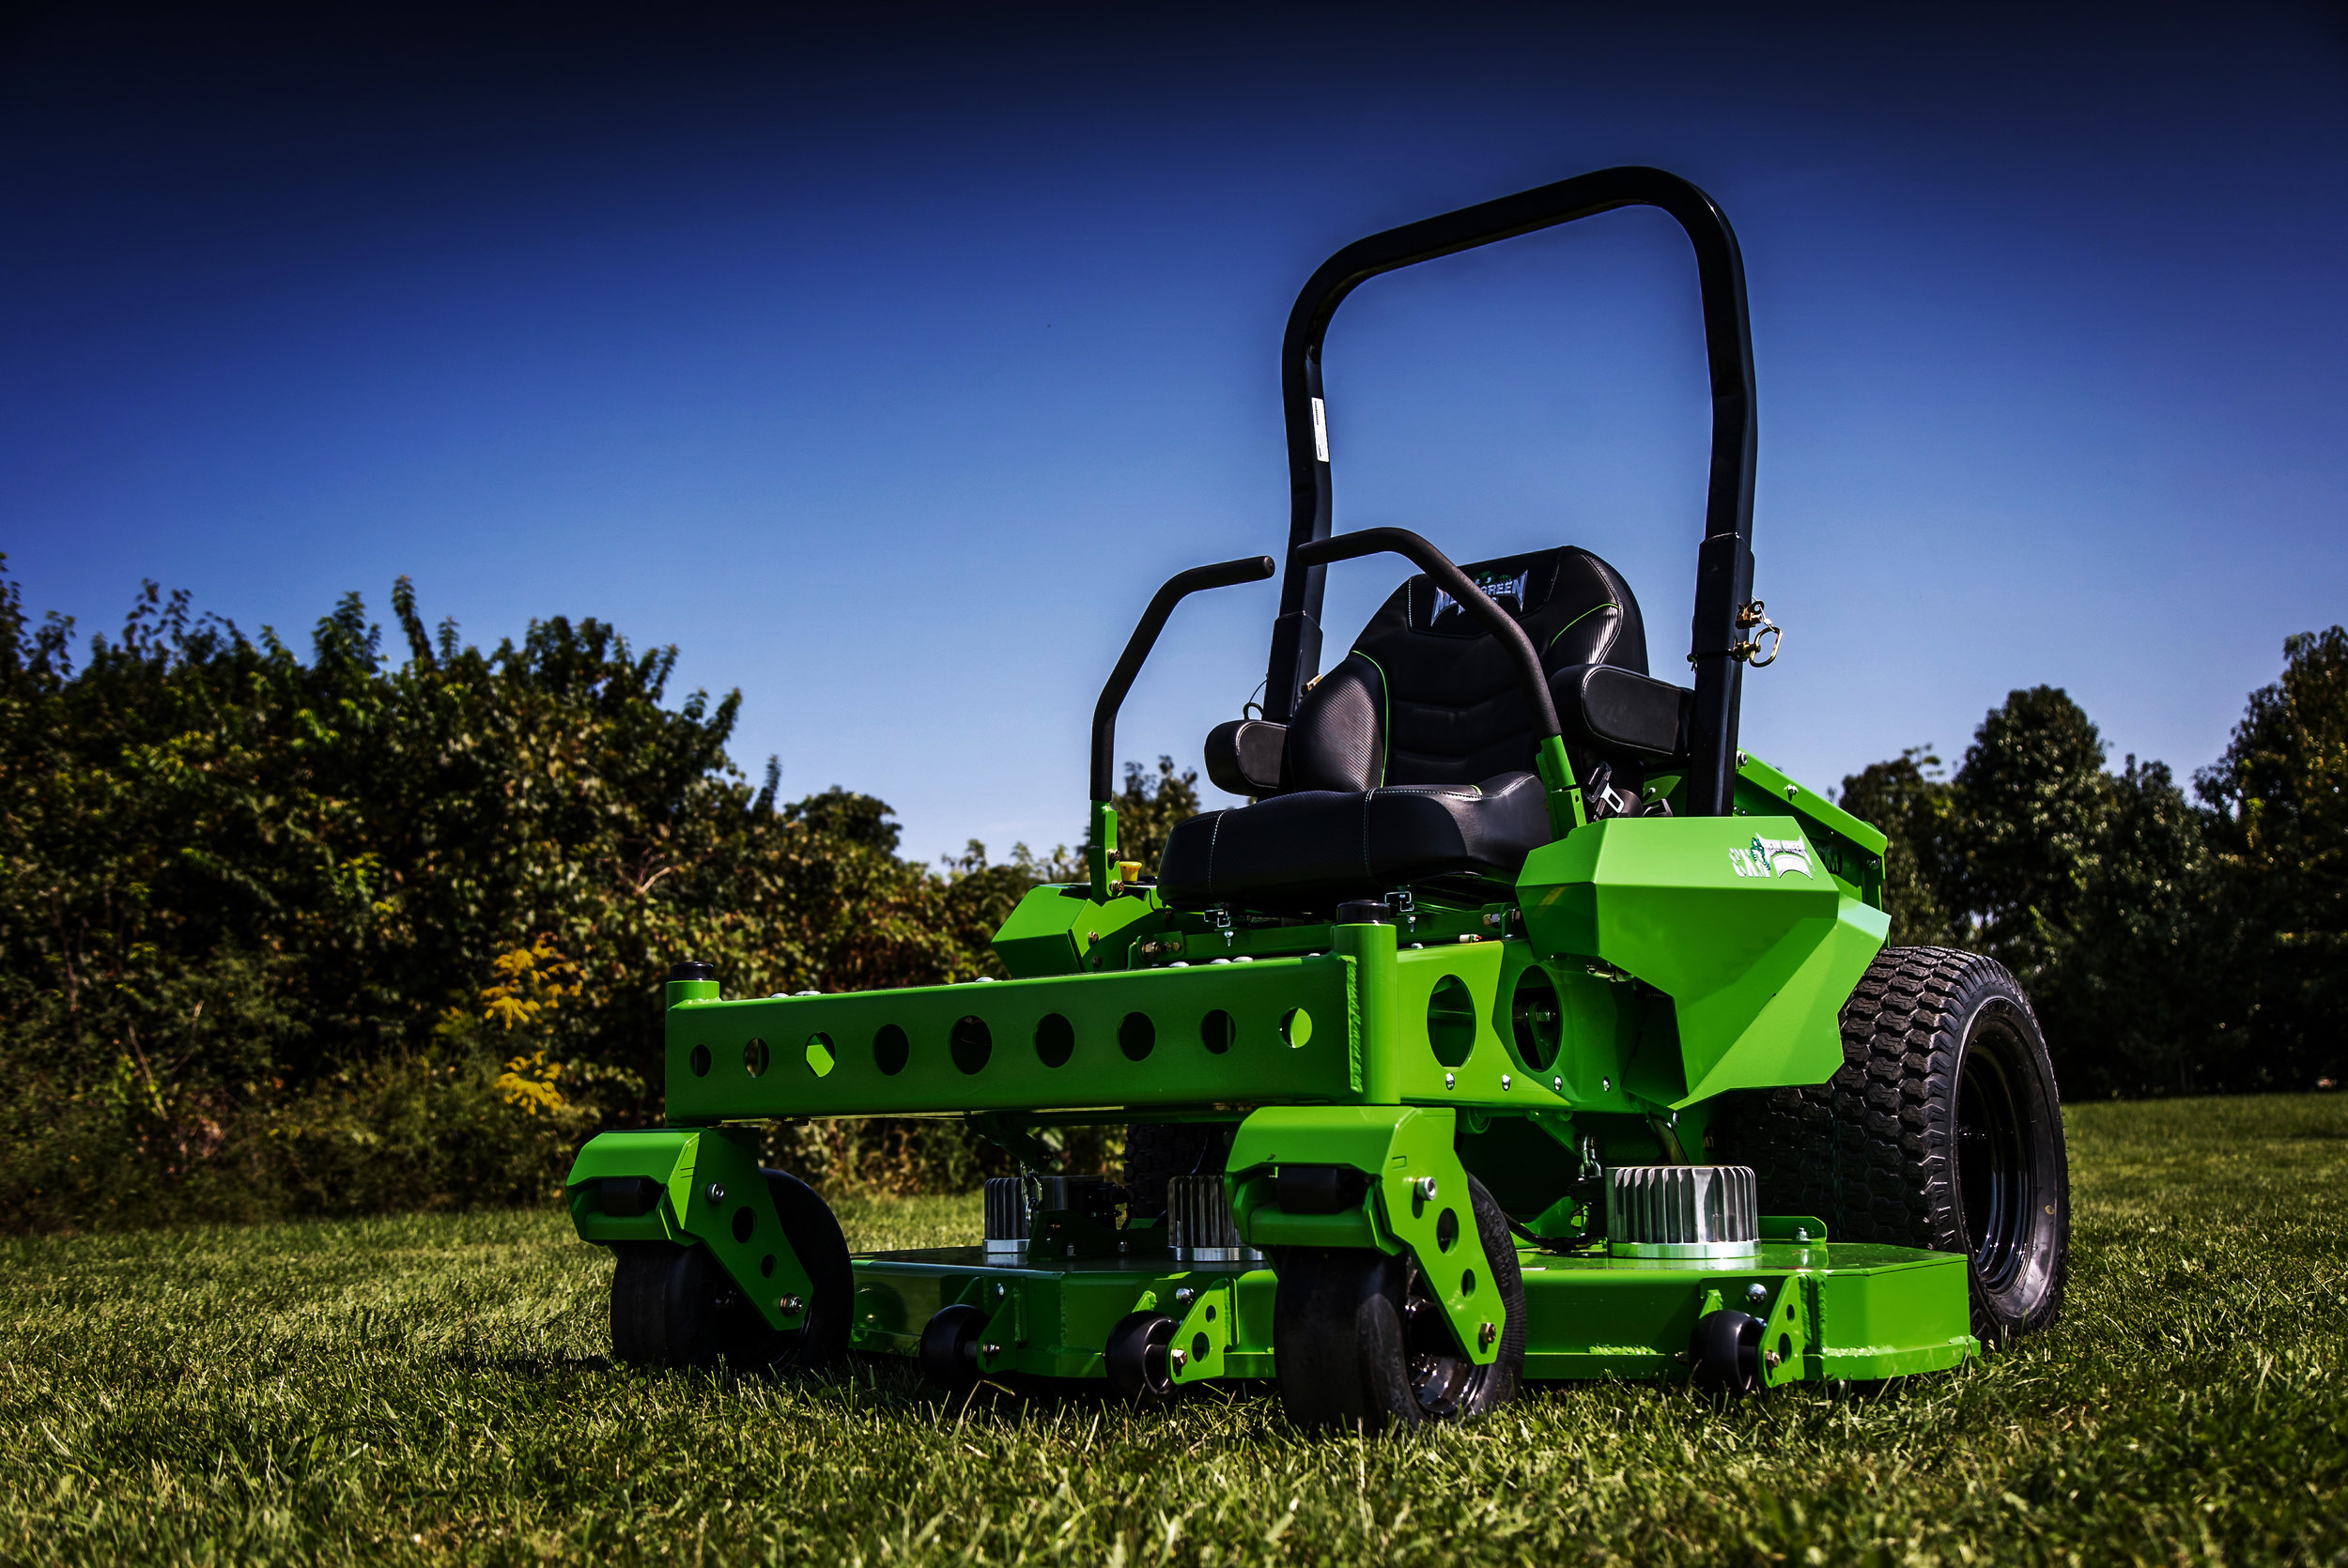 Mean Green Mowers Wiring Diagram Car Lift Further John Deere Lawn Mower Warning Light The Future Is